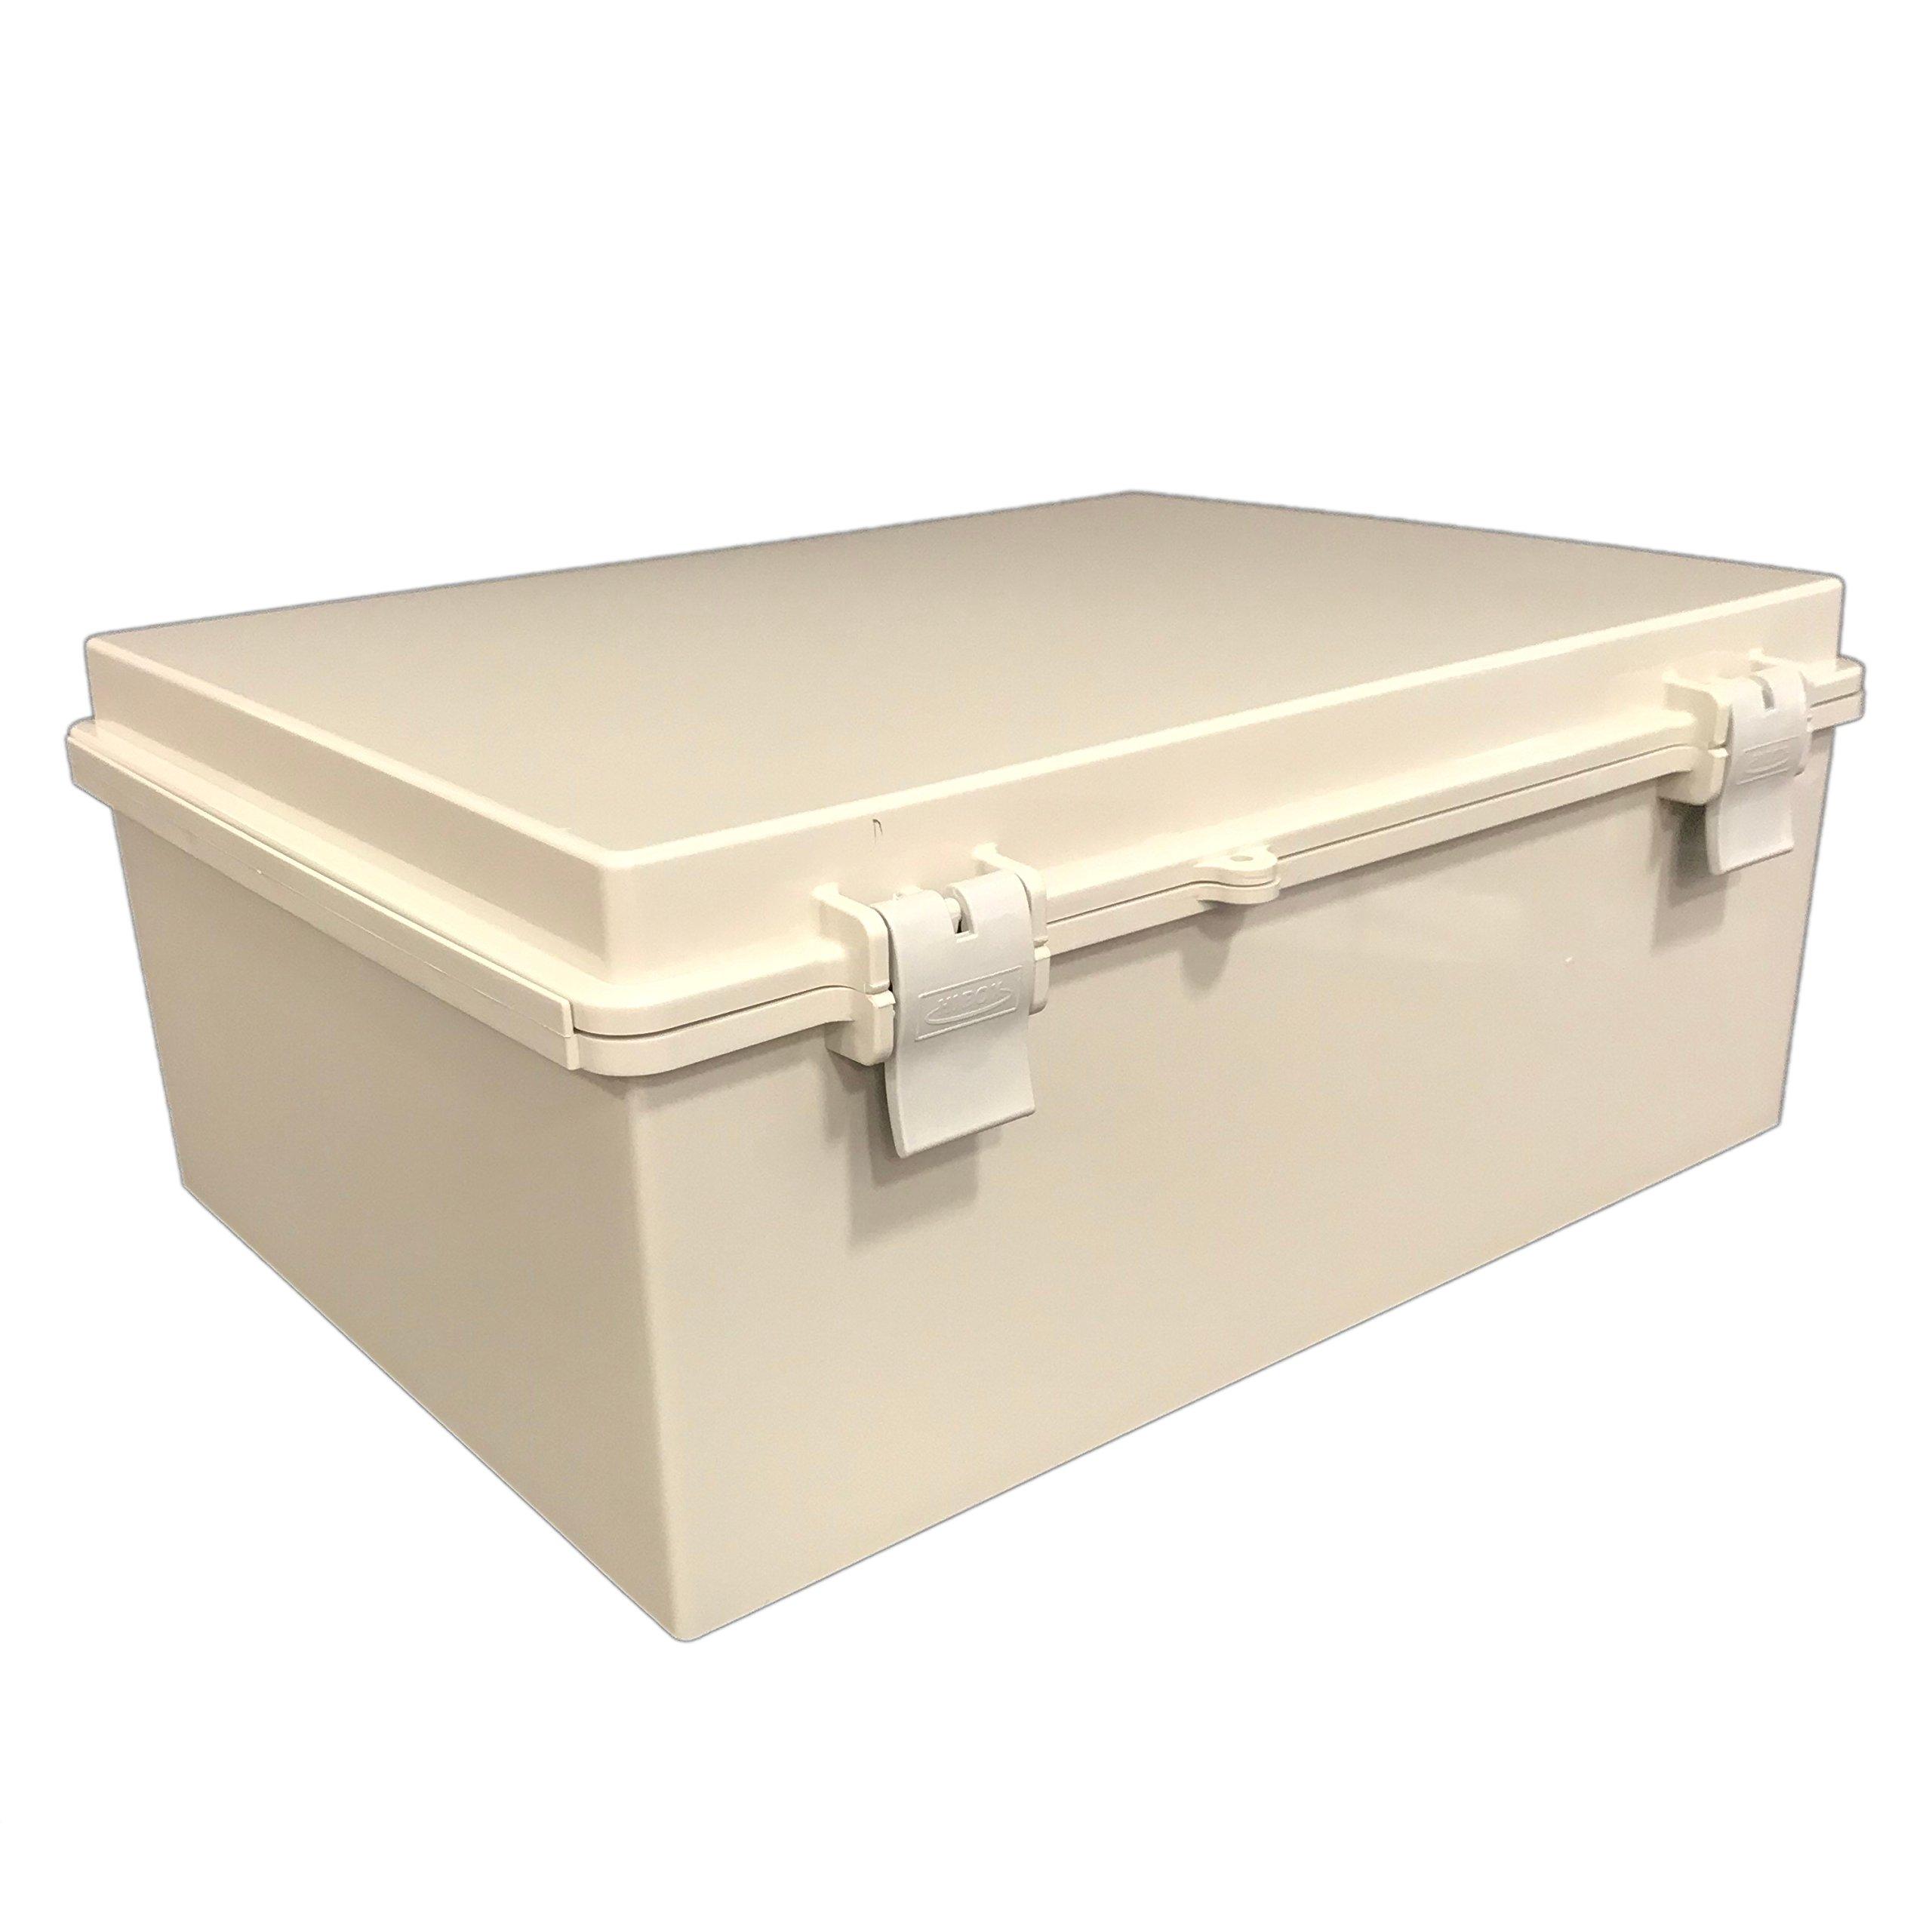 BUD Industries NBF-32026 Plastic ABS NEMA Economy Box with Solid Door, 15-47/64'' Length x 11-51/64'' Width x 6-9/32'' Height, Light Gray Finish